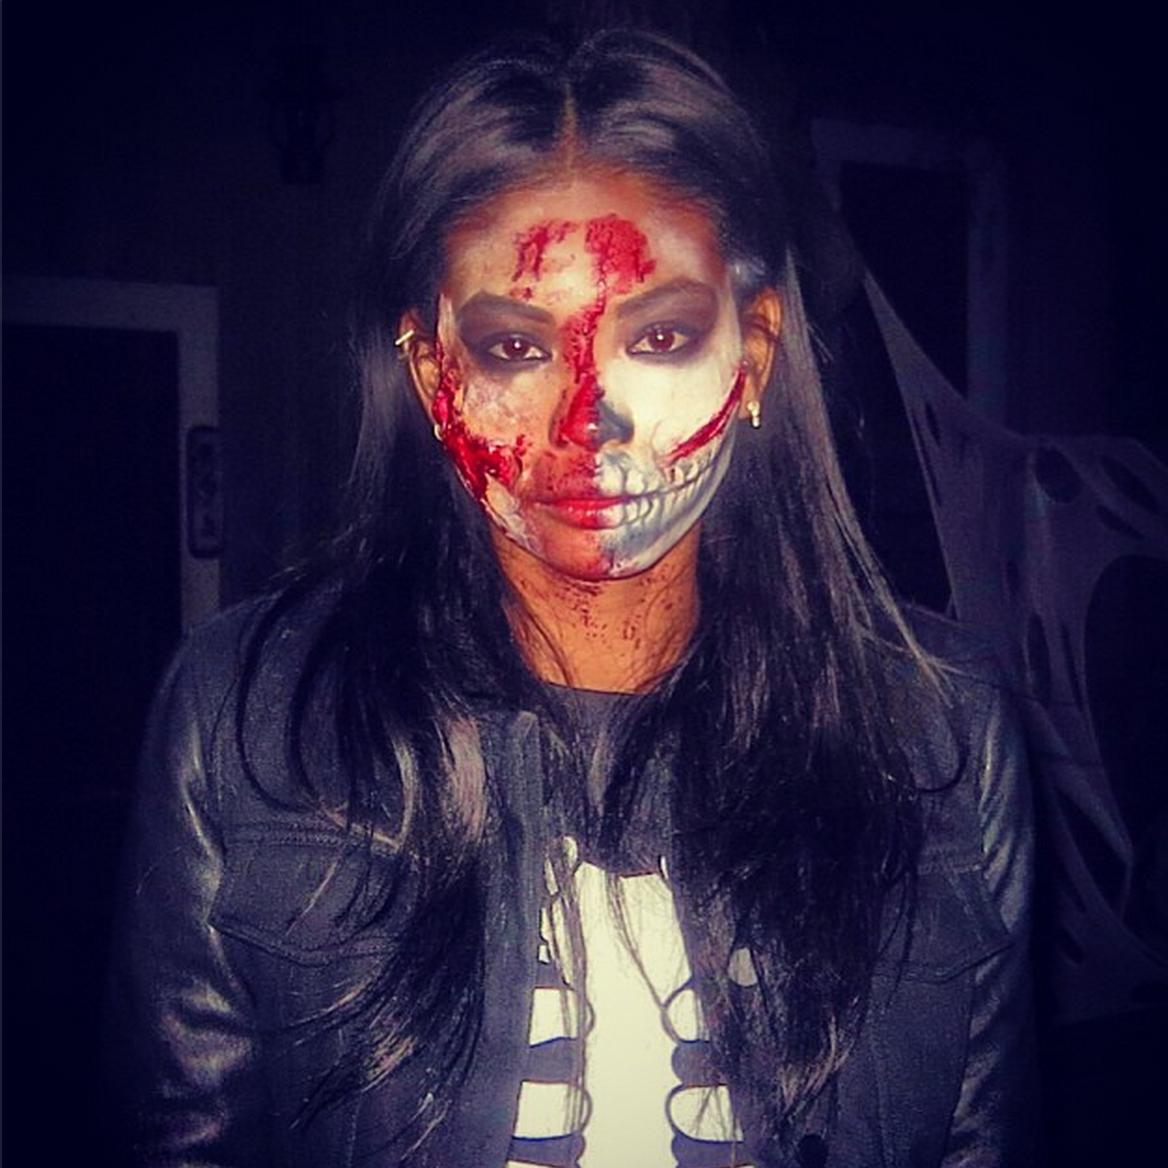 Horror night!